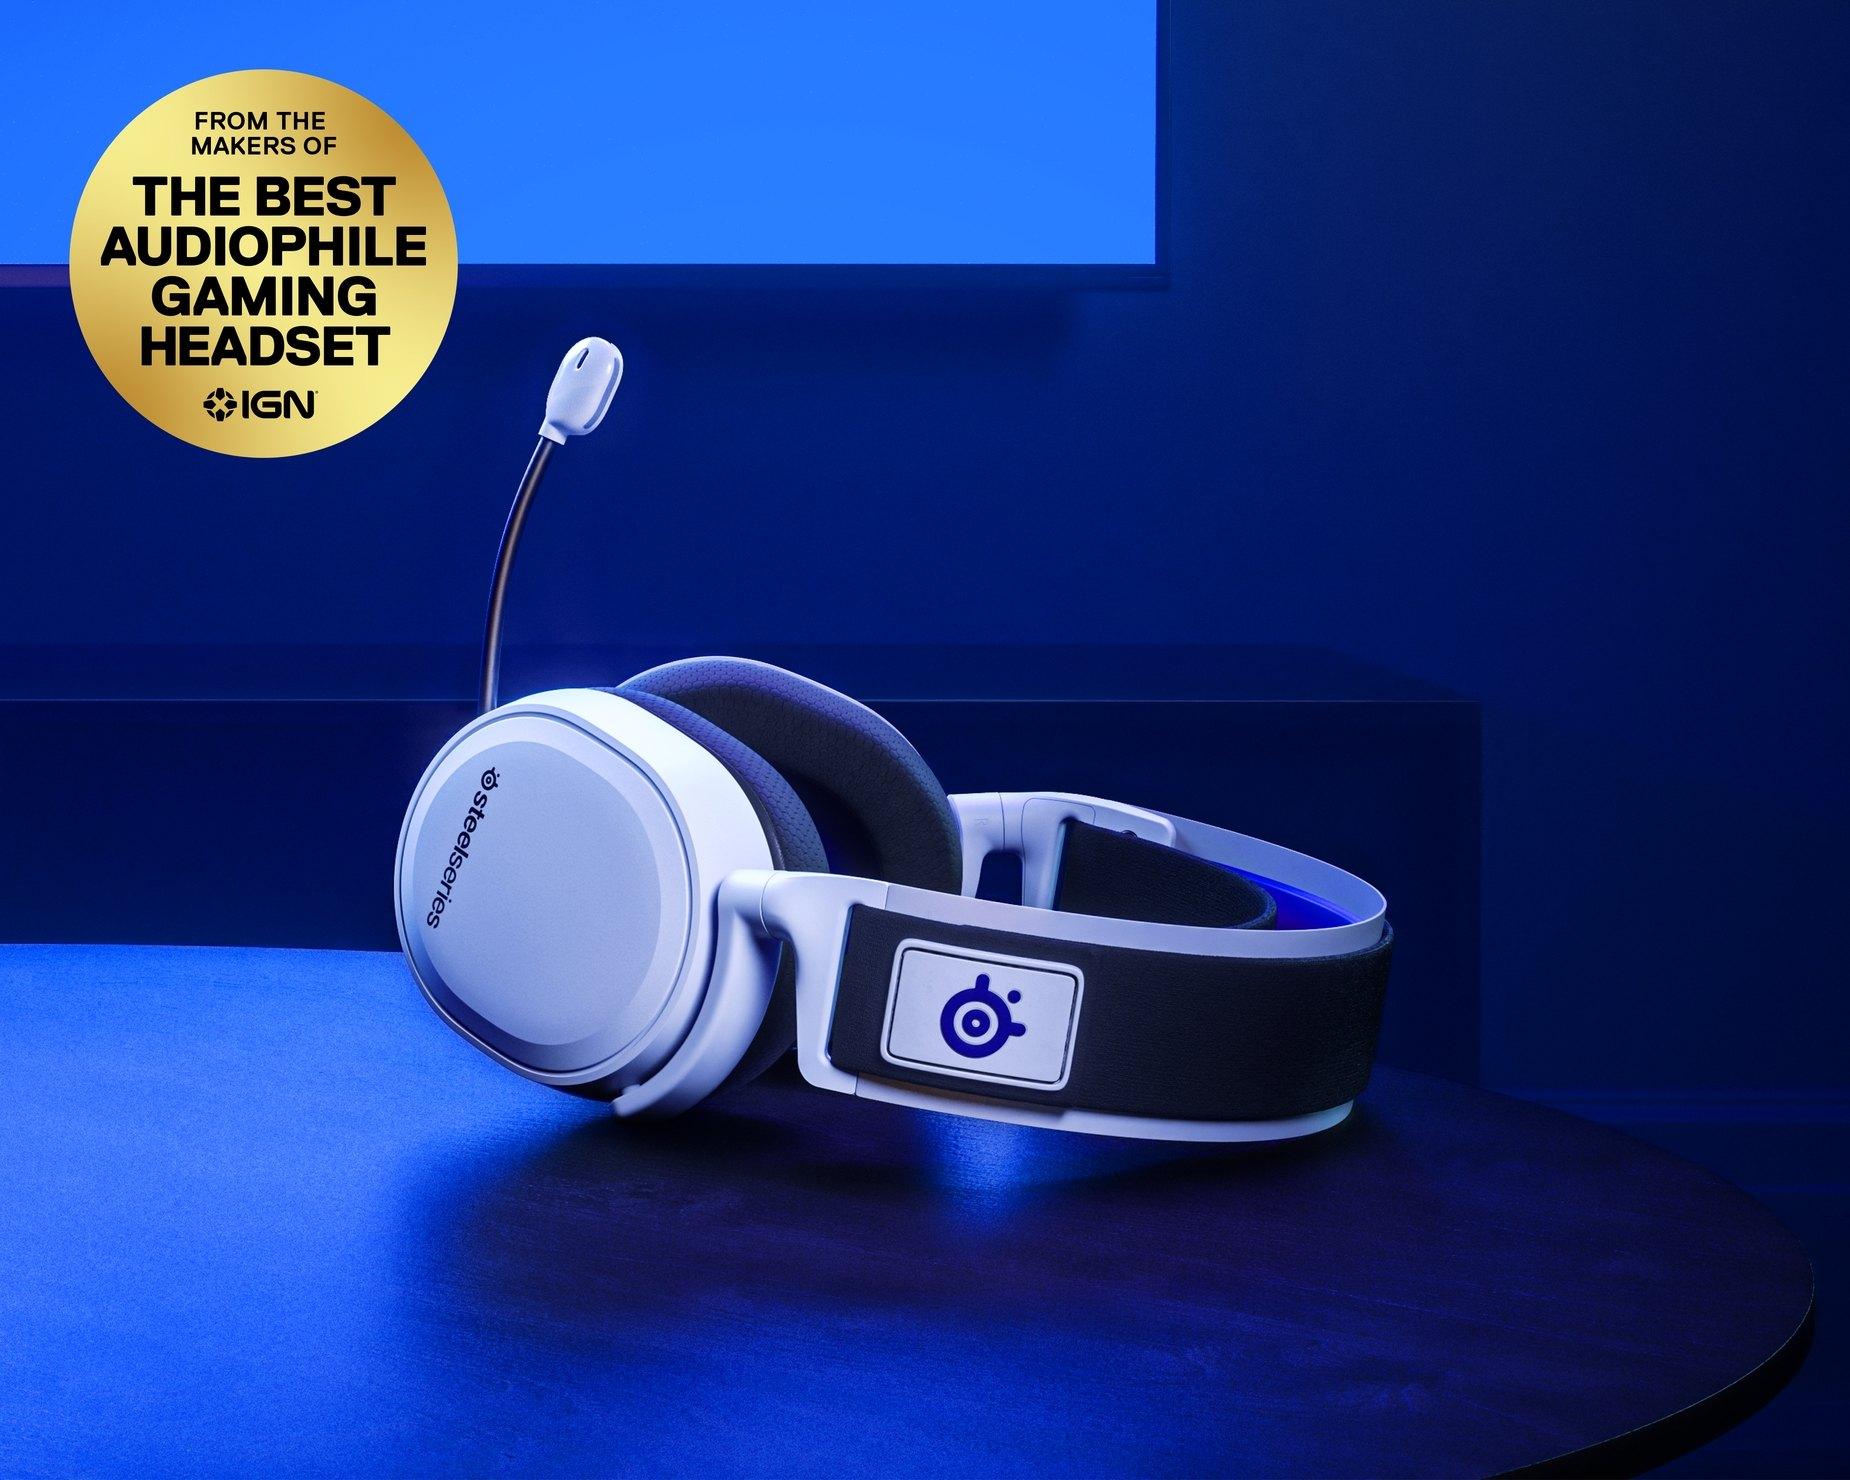 Arctis 耳機平放,且麥克風呈現打開的位置,PlayStation 色相